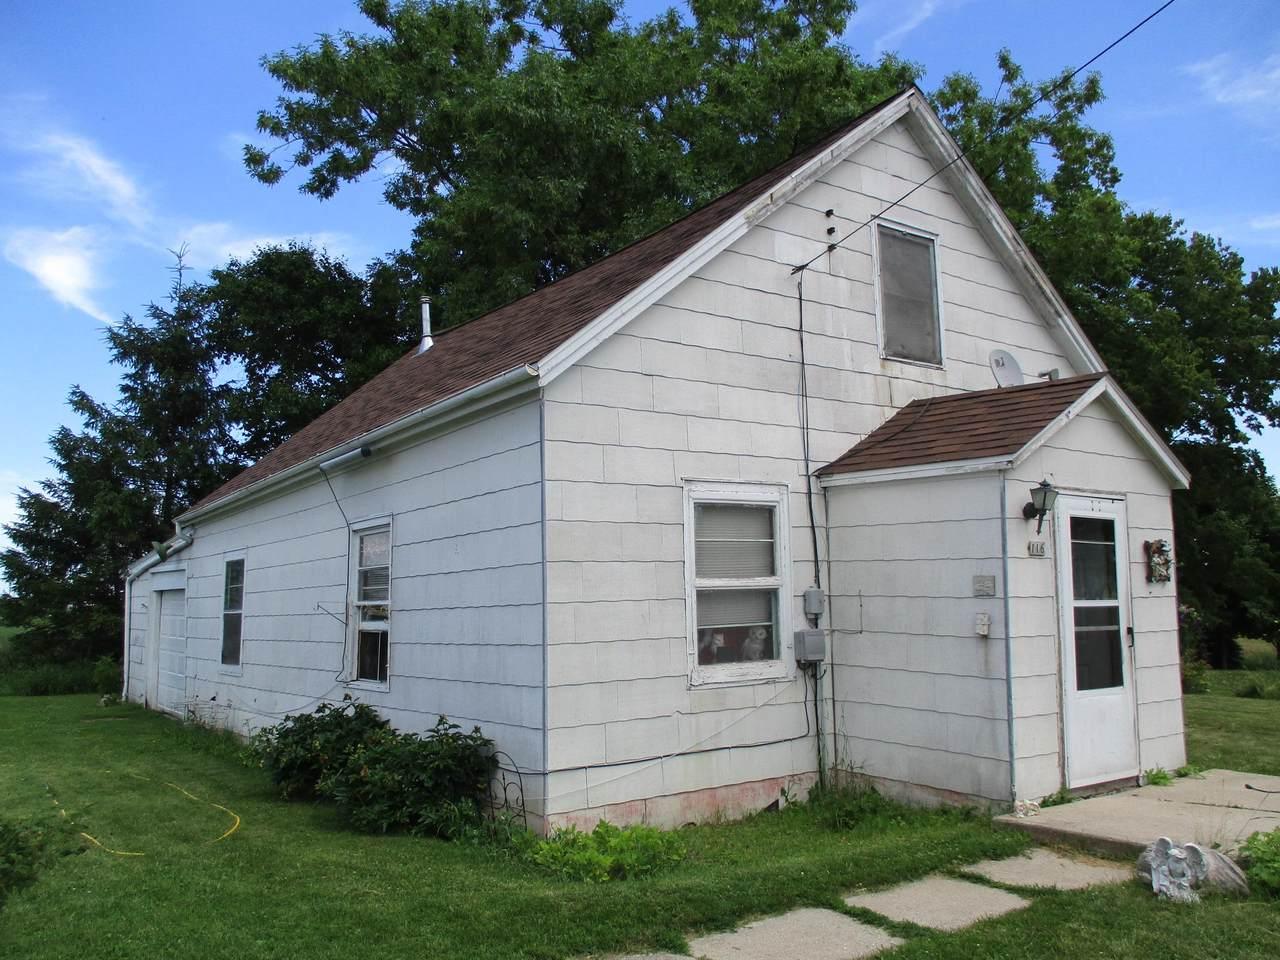 116 Hillcrest Rd - Photo 1